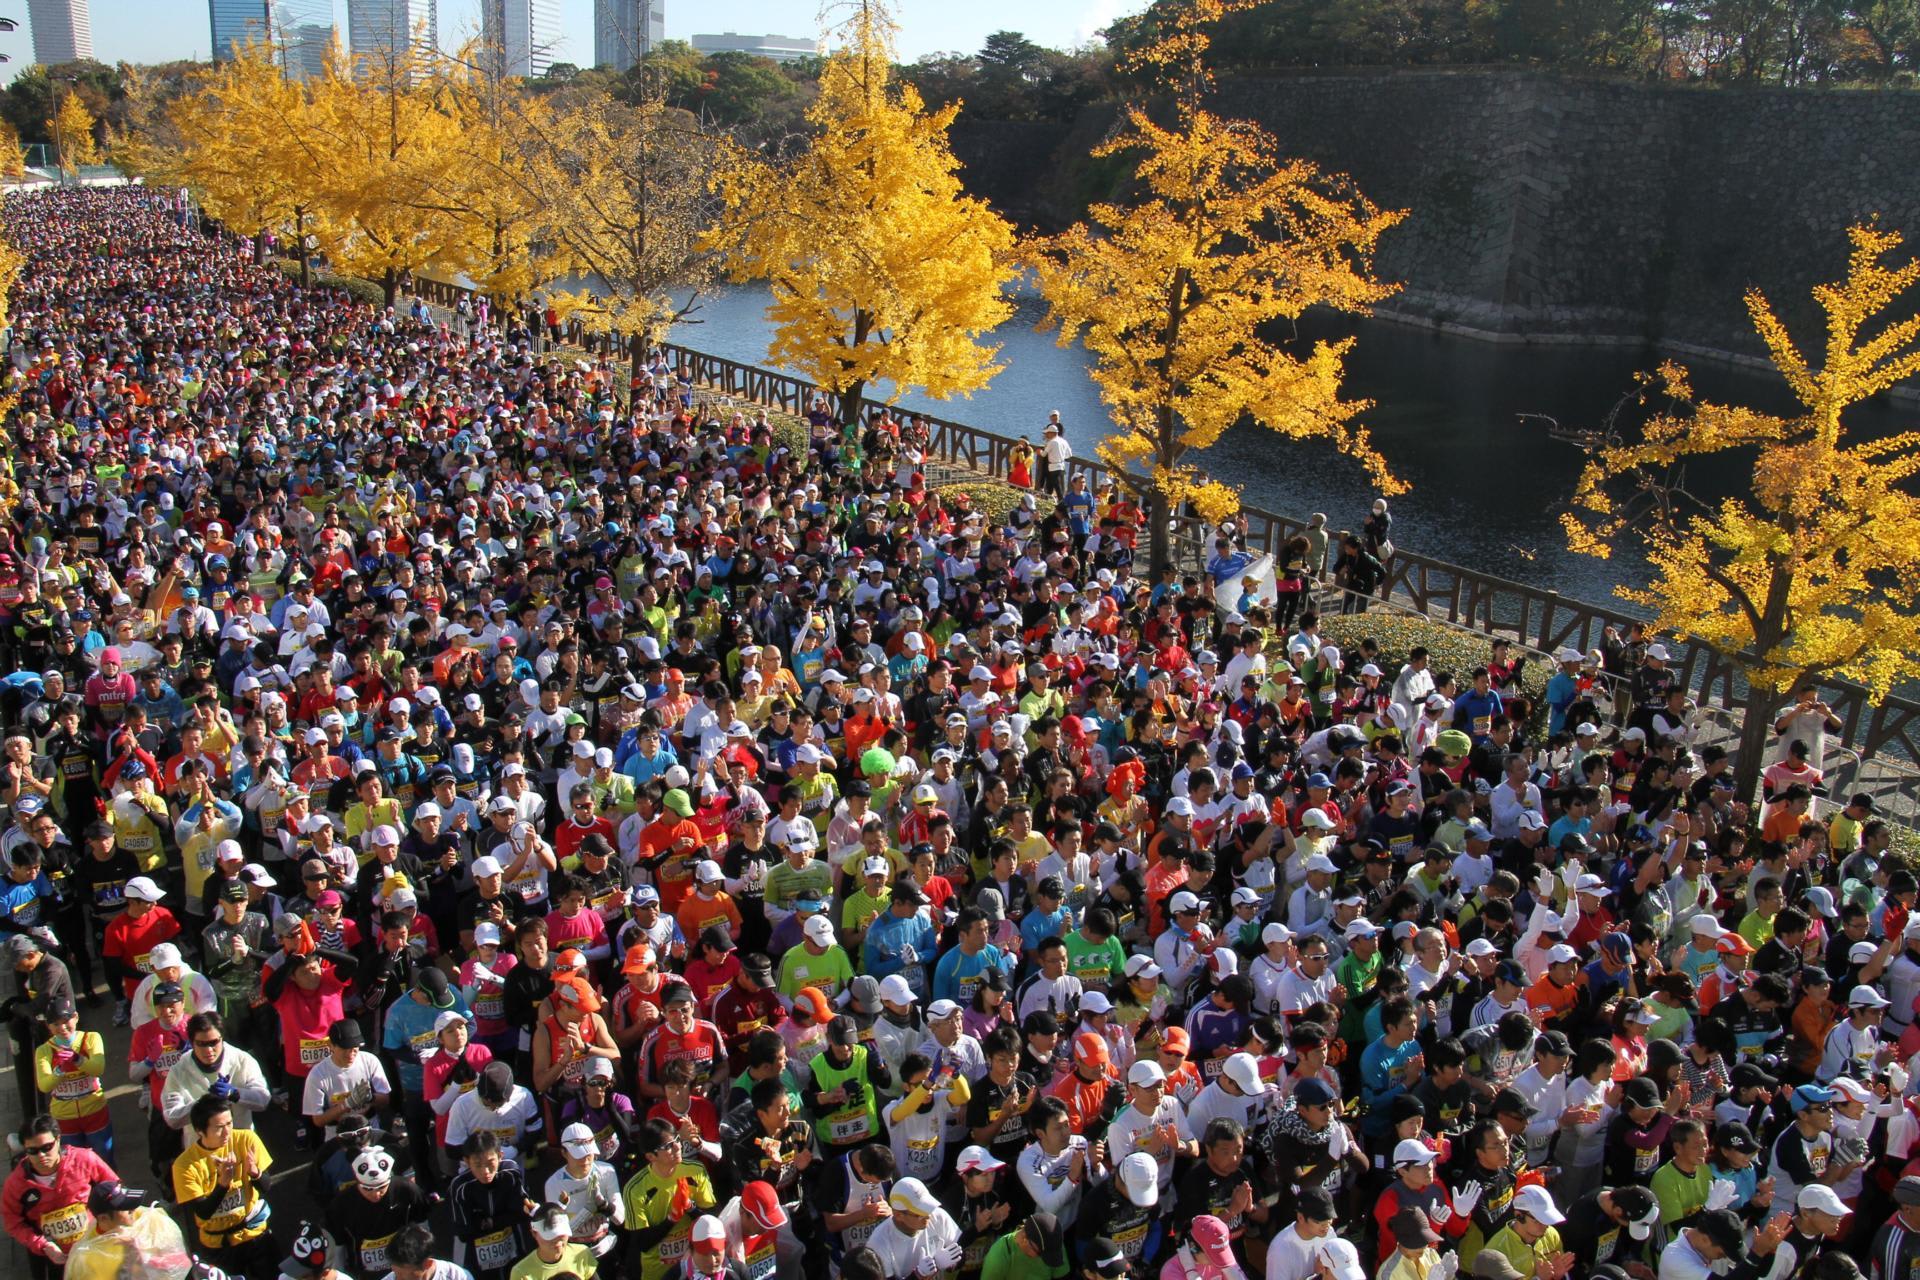 大阪マラソン2012写真集 - 神戸 ...